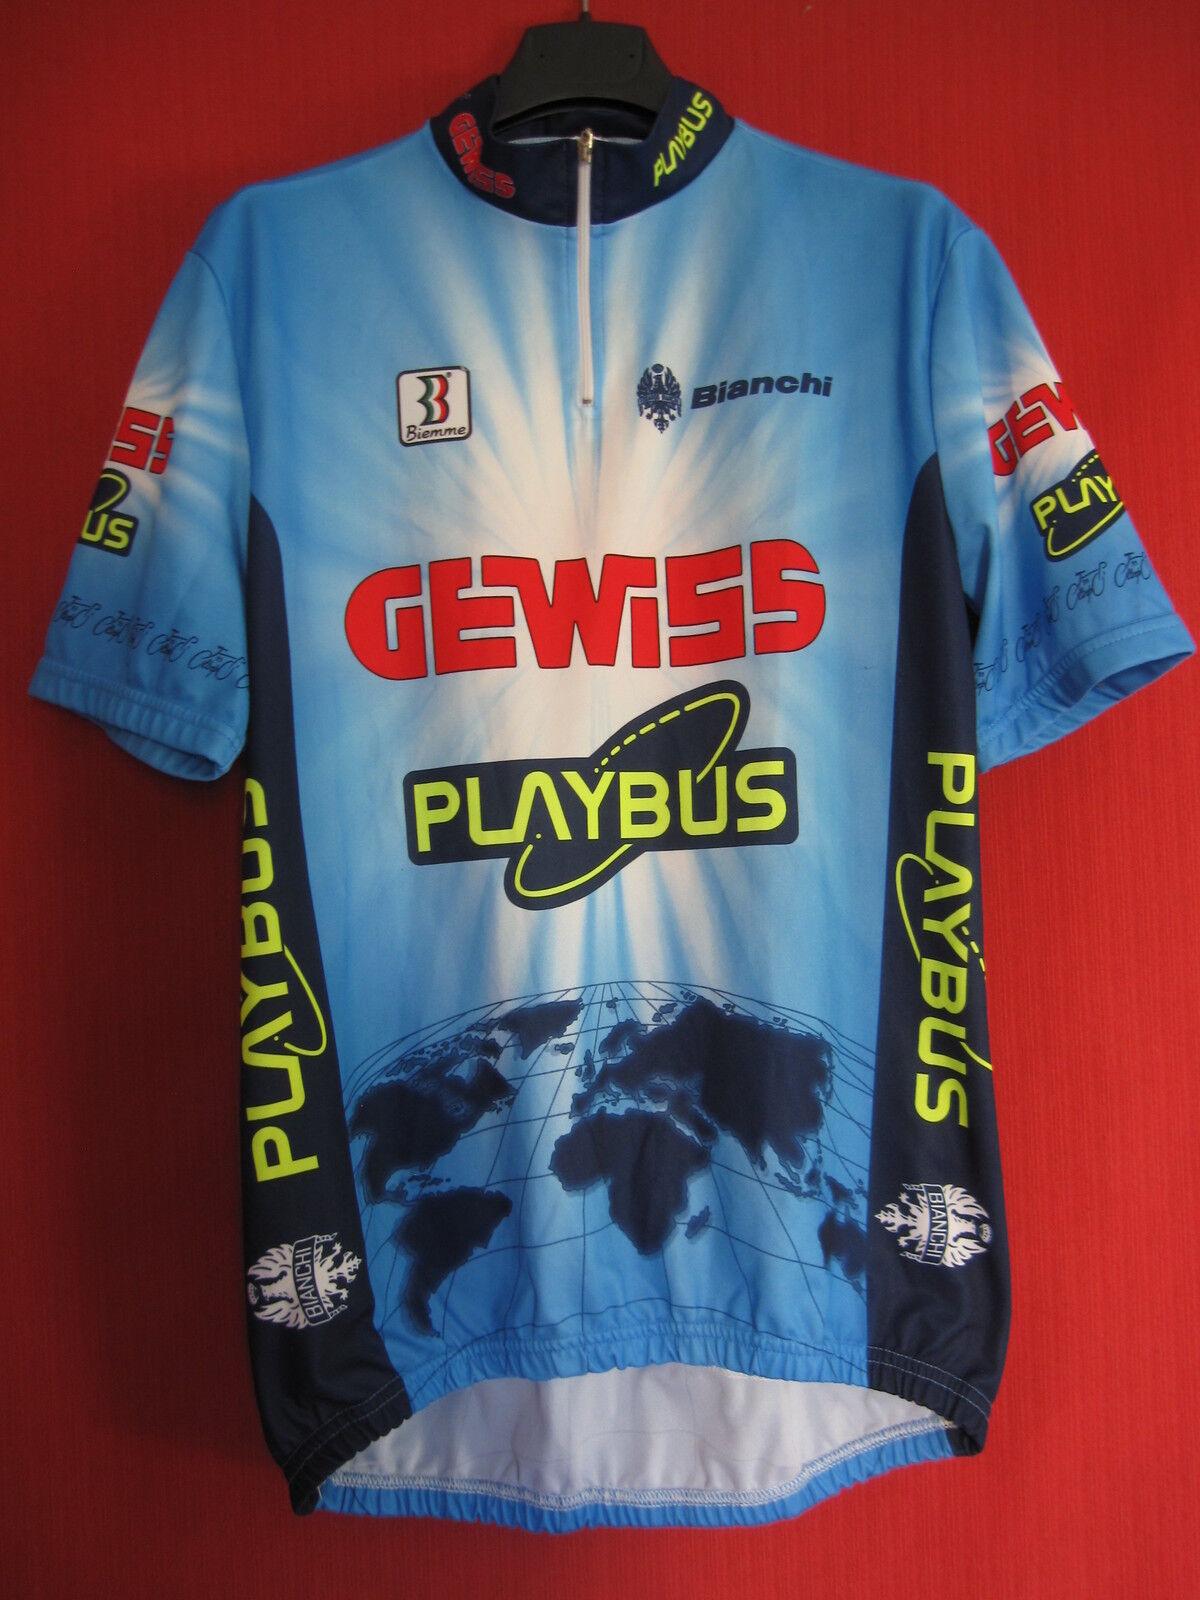 Maillot cycliste GEWISS Playbus Biemme Equipe Pro 1996 Vintage - 6   XXL